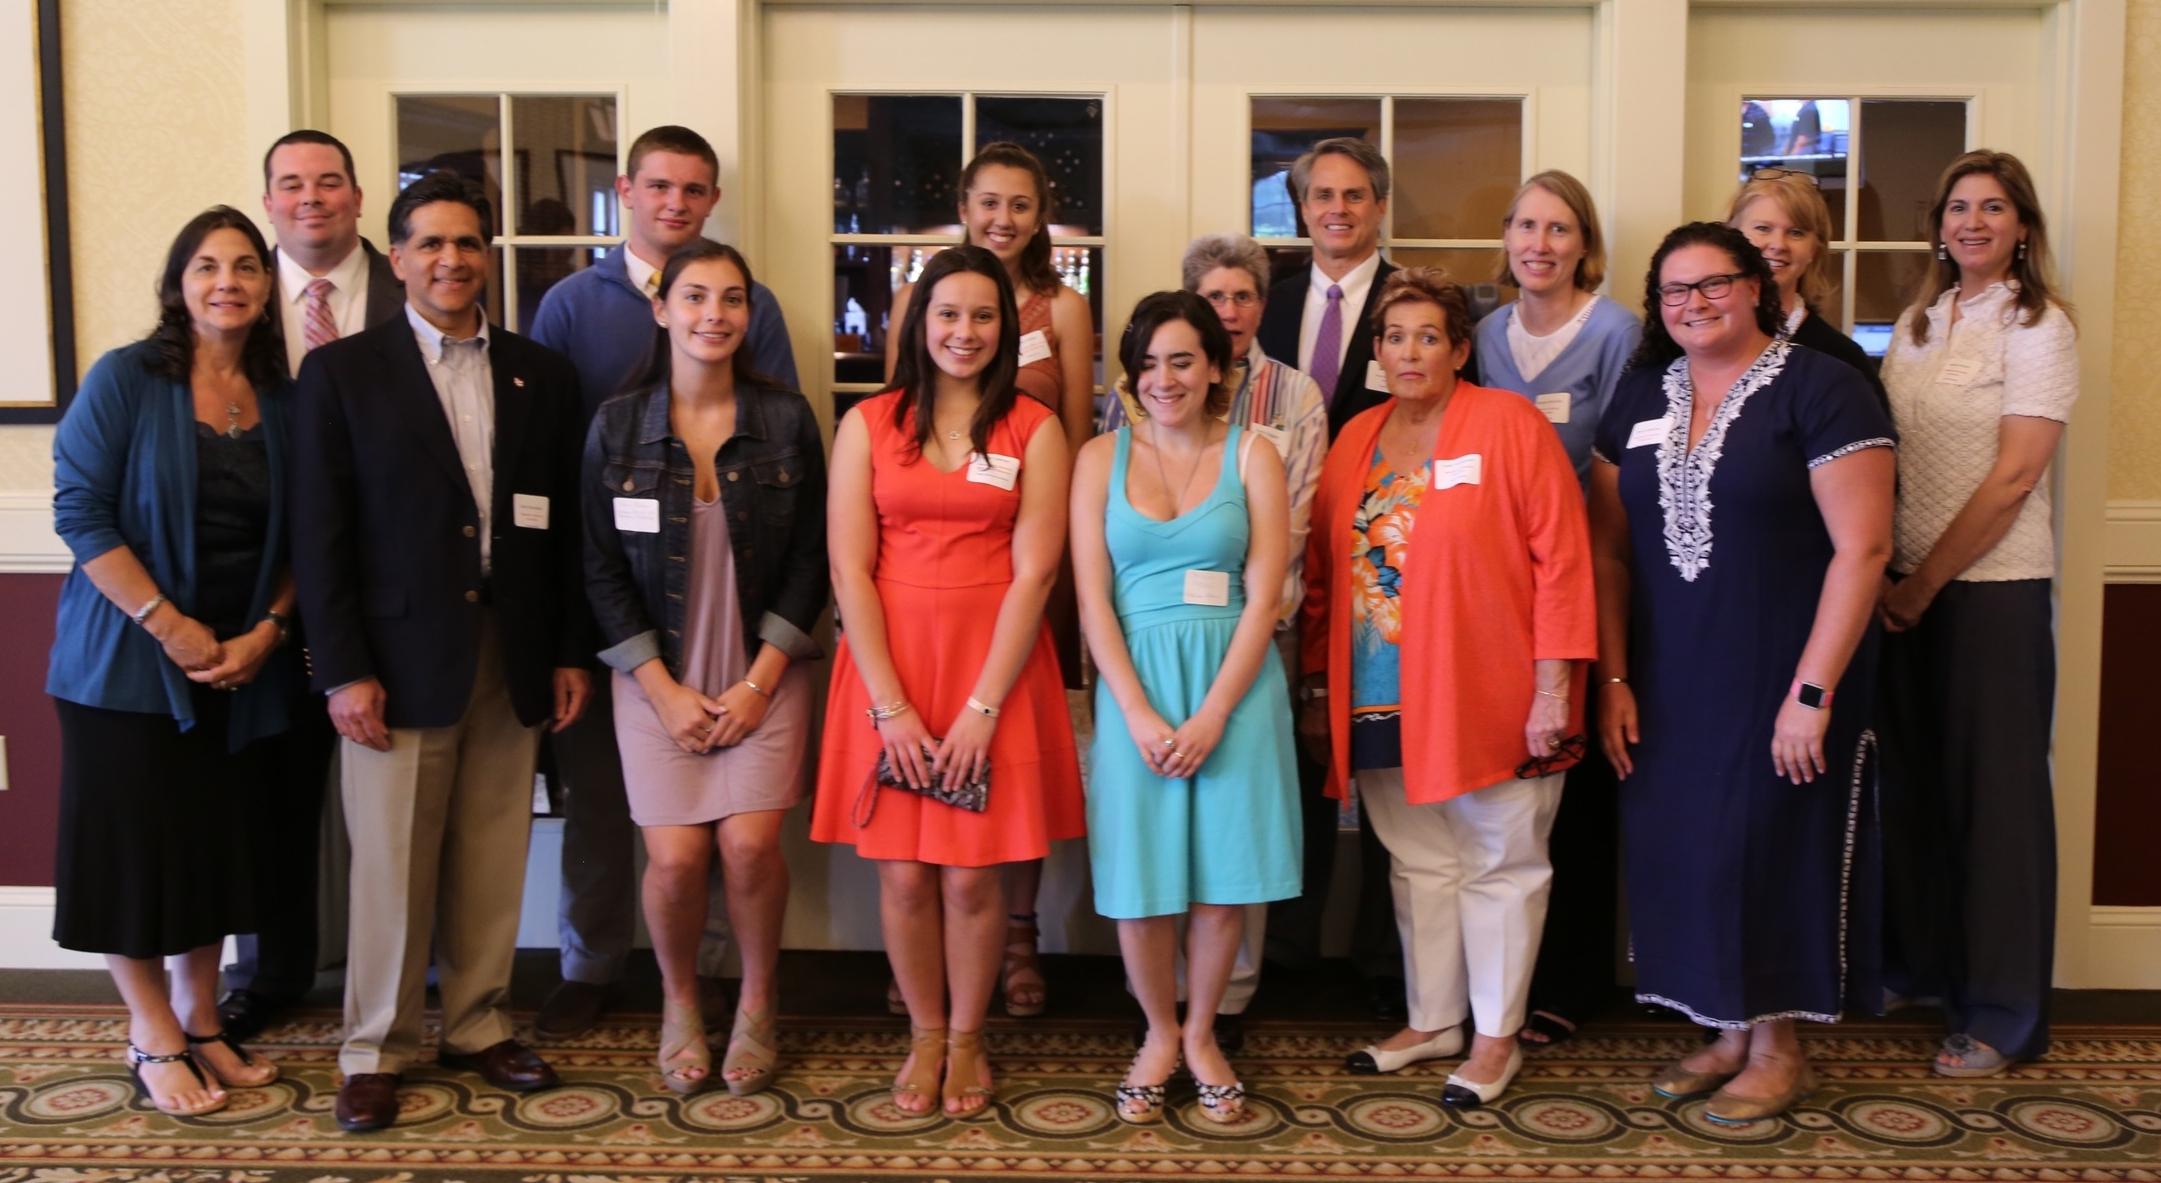 Newtown Scholarship Hononary Member Scholarships